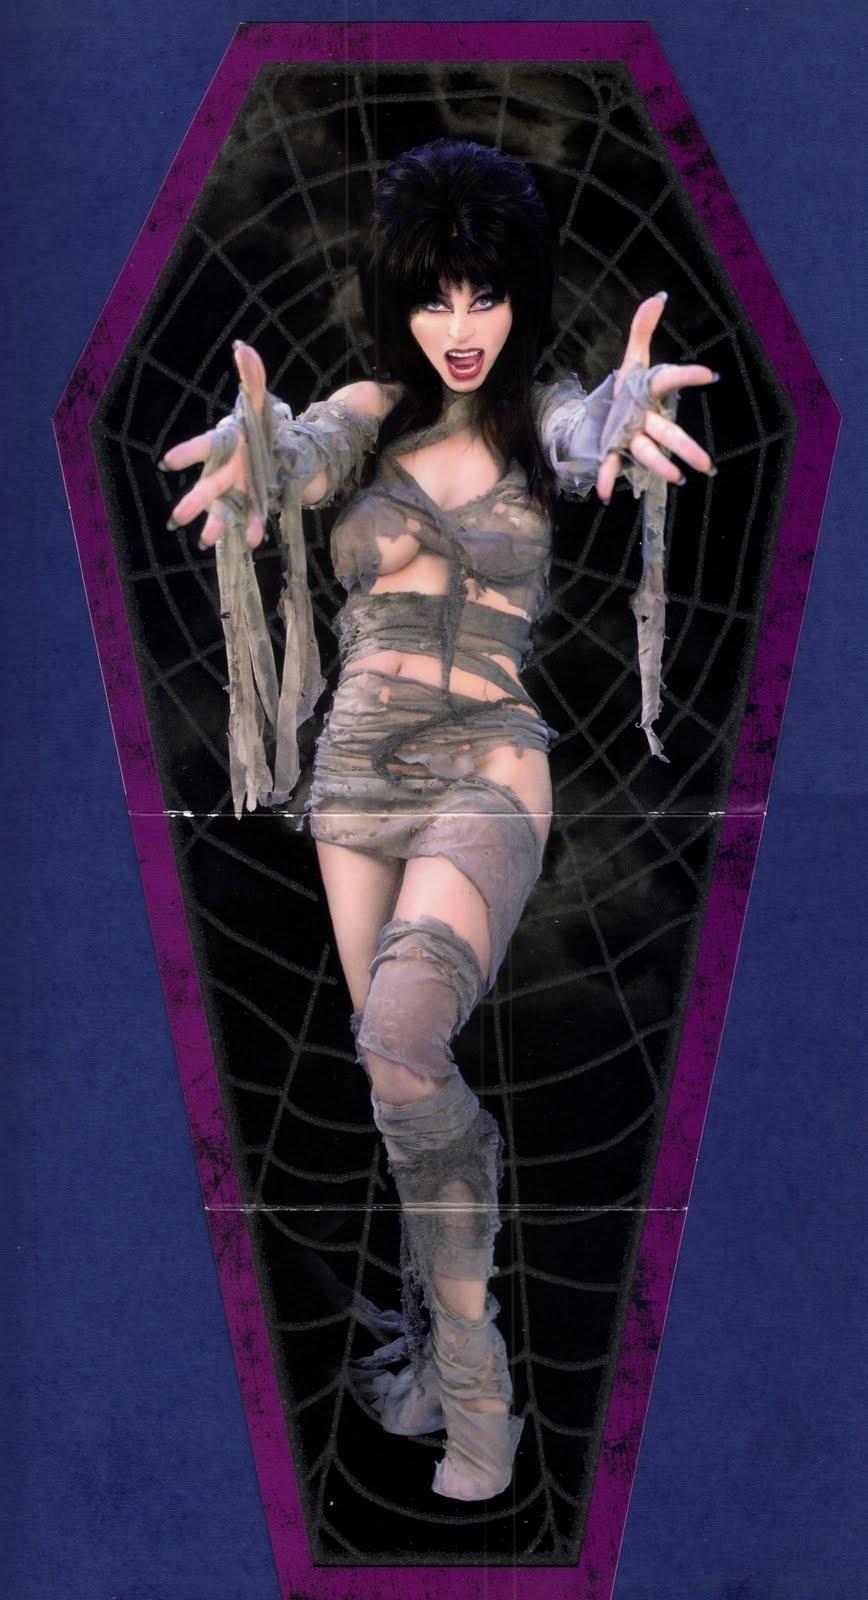 Elvira mistress of the dark naked pic 54